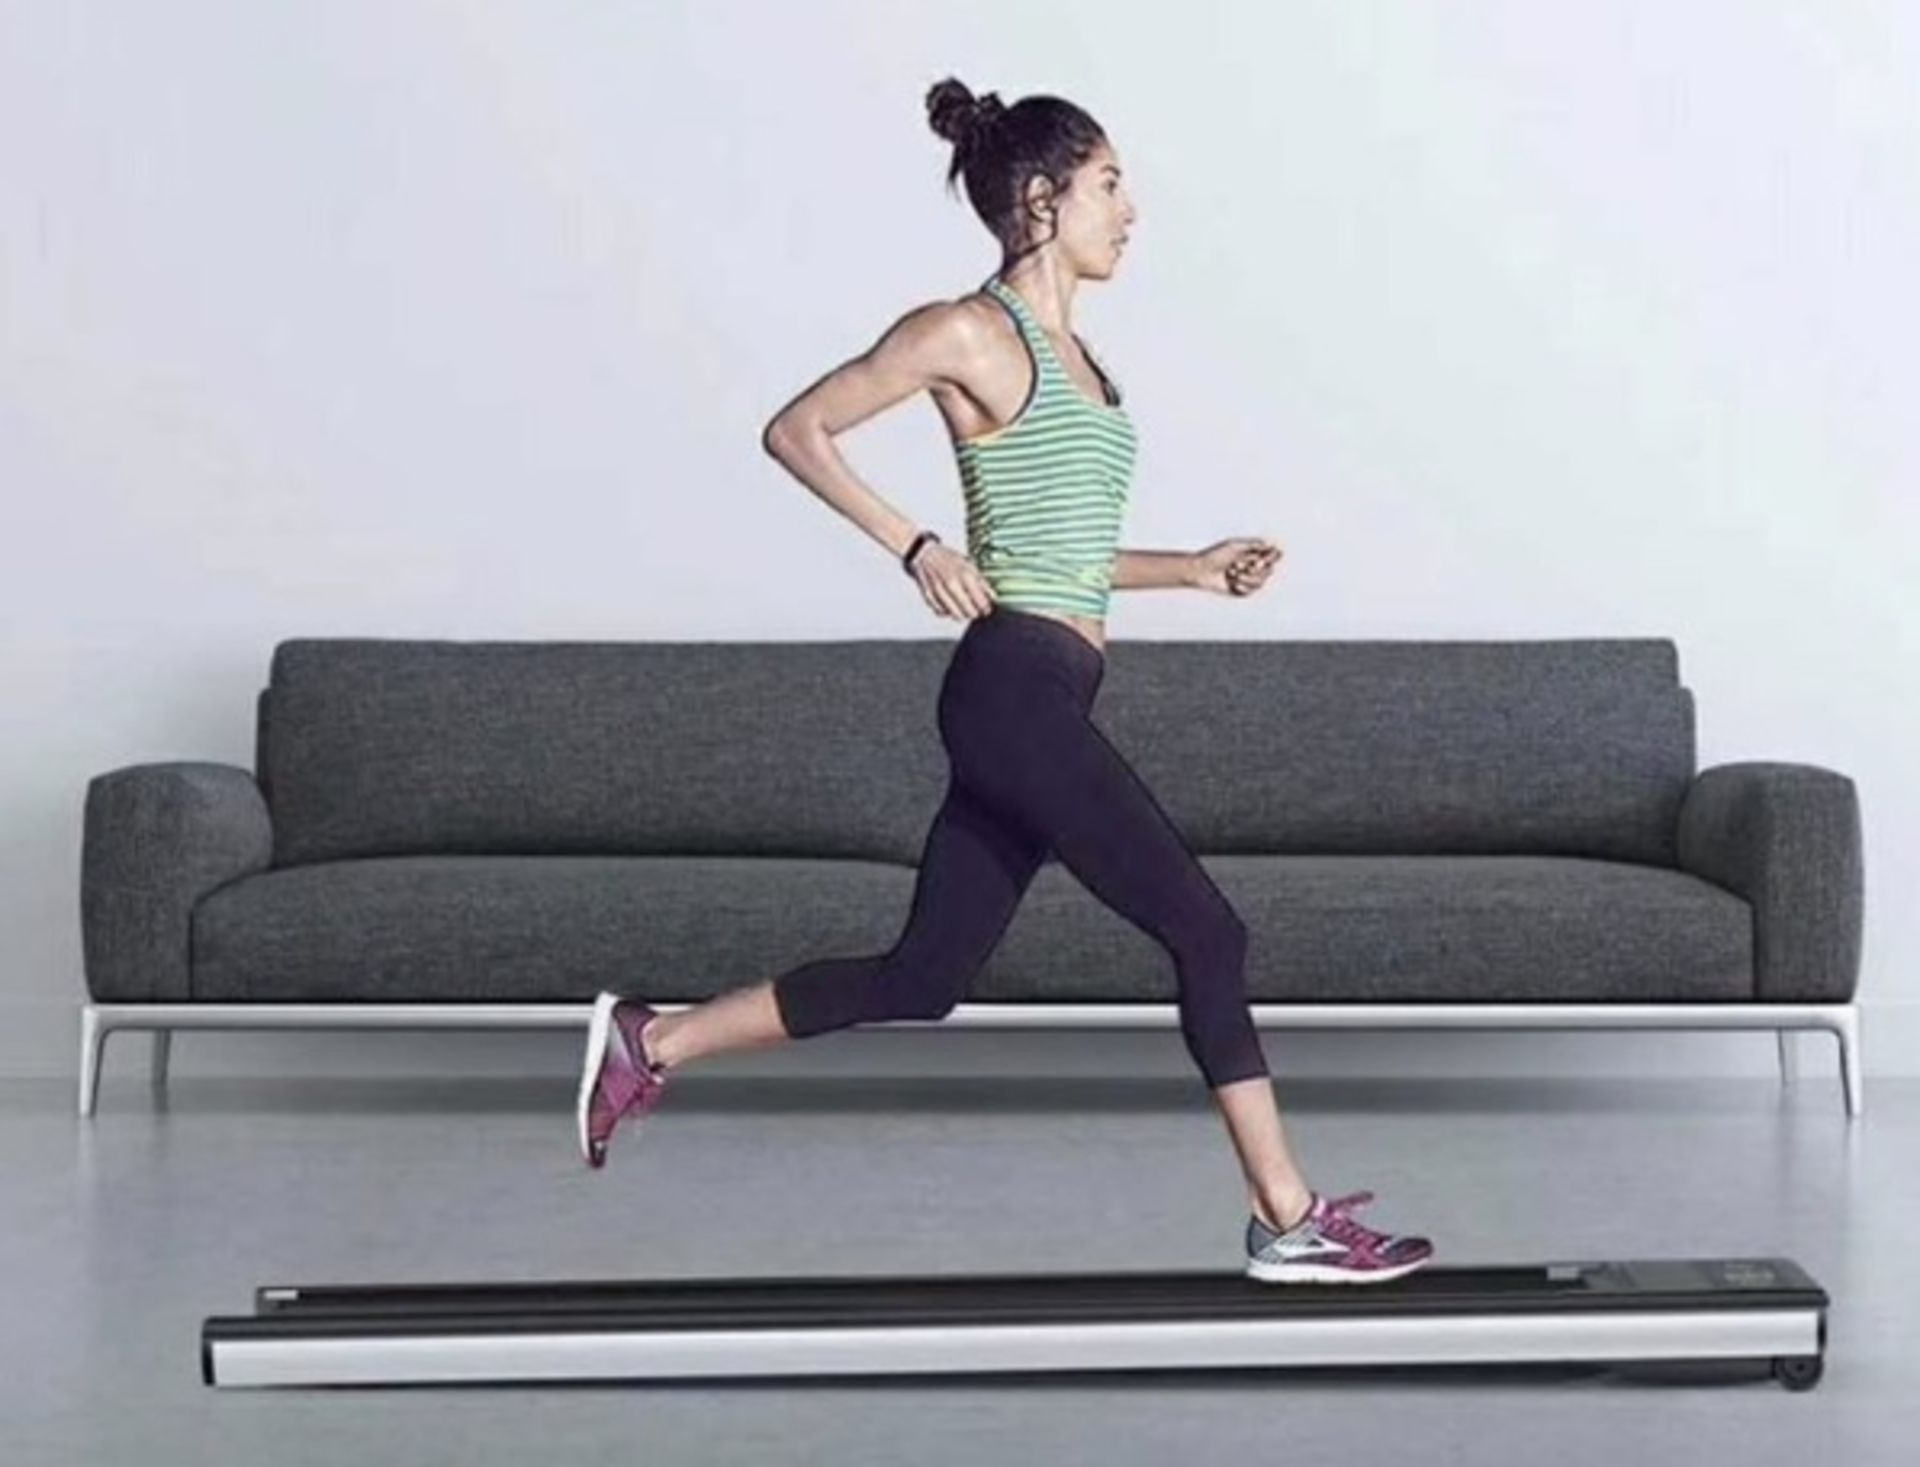 1 x Slim Tread Ultra Thin Smart Treadmill Running / Walking Machine - Lightweight With Folding - Image 4 of 23